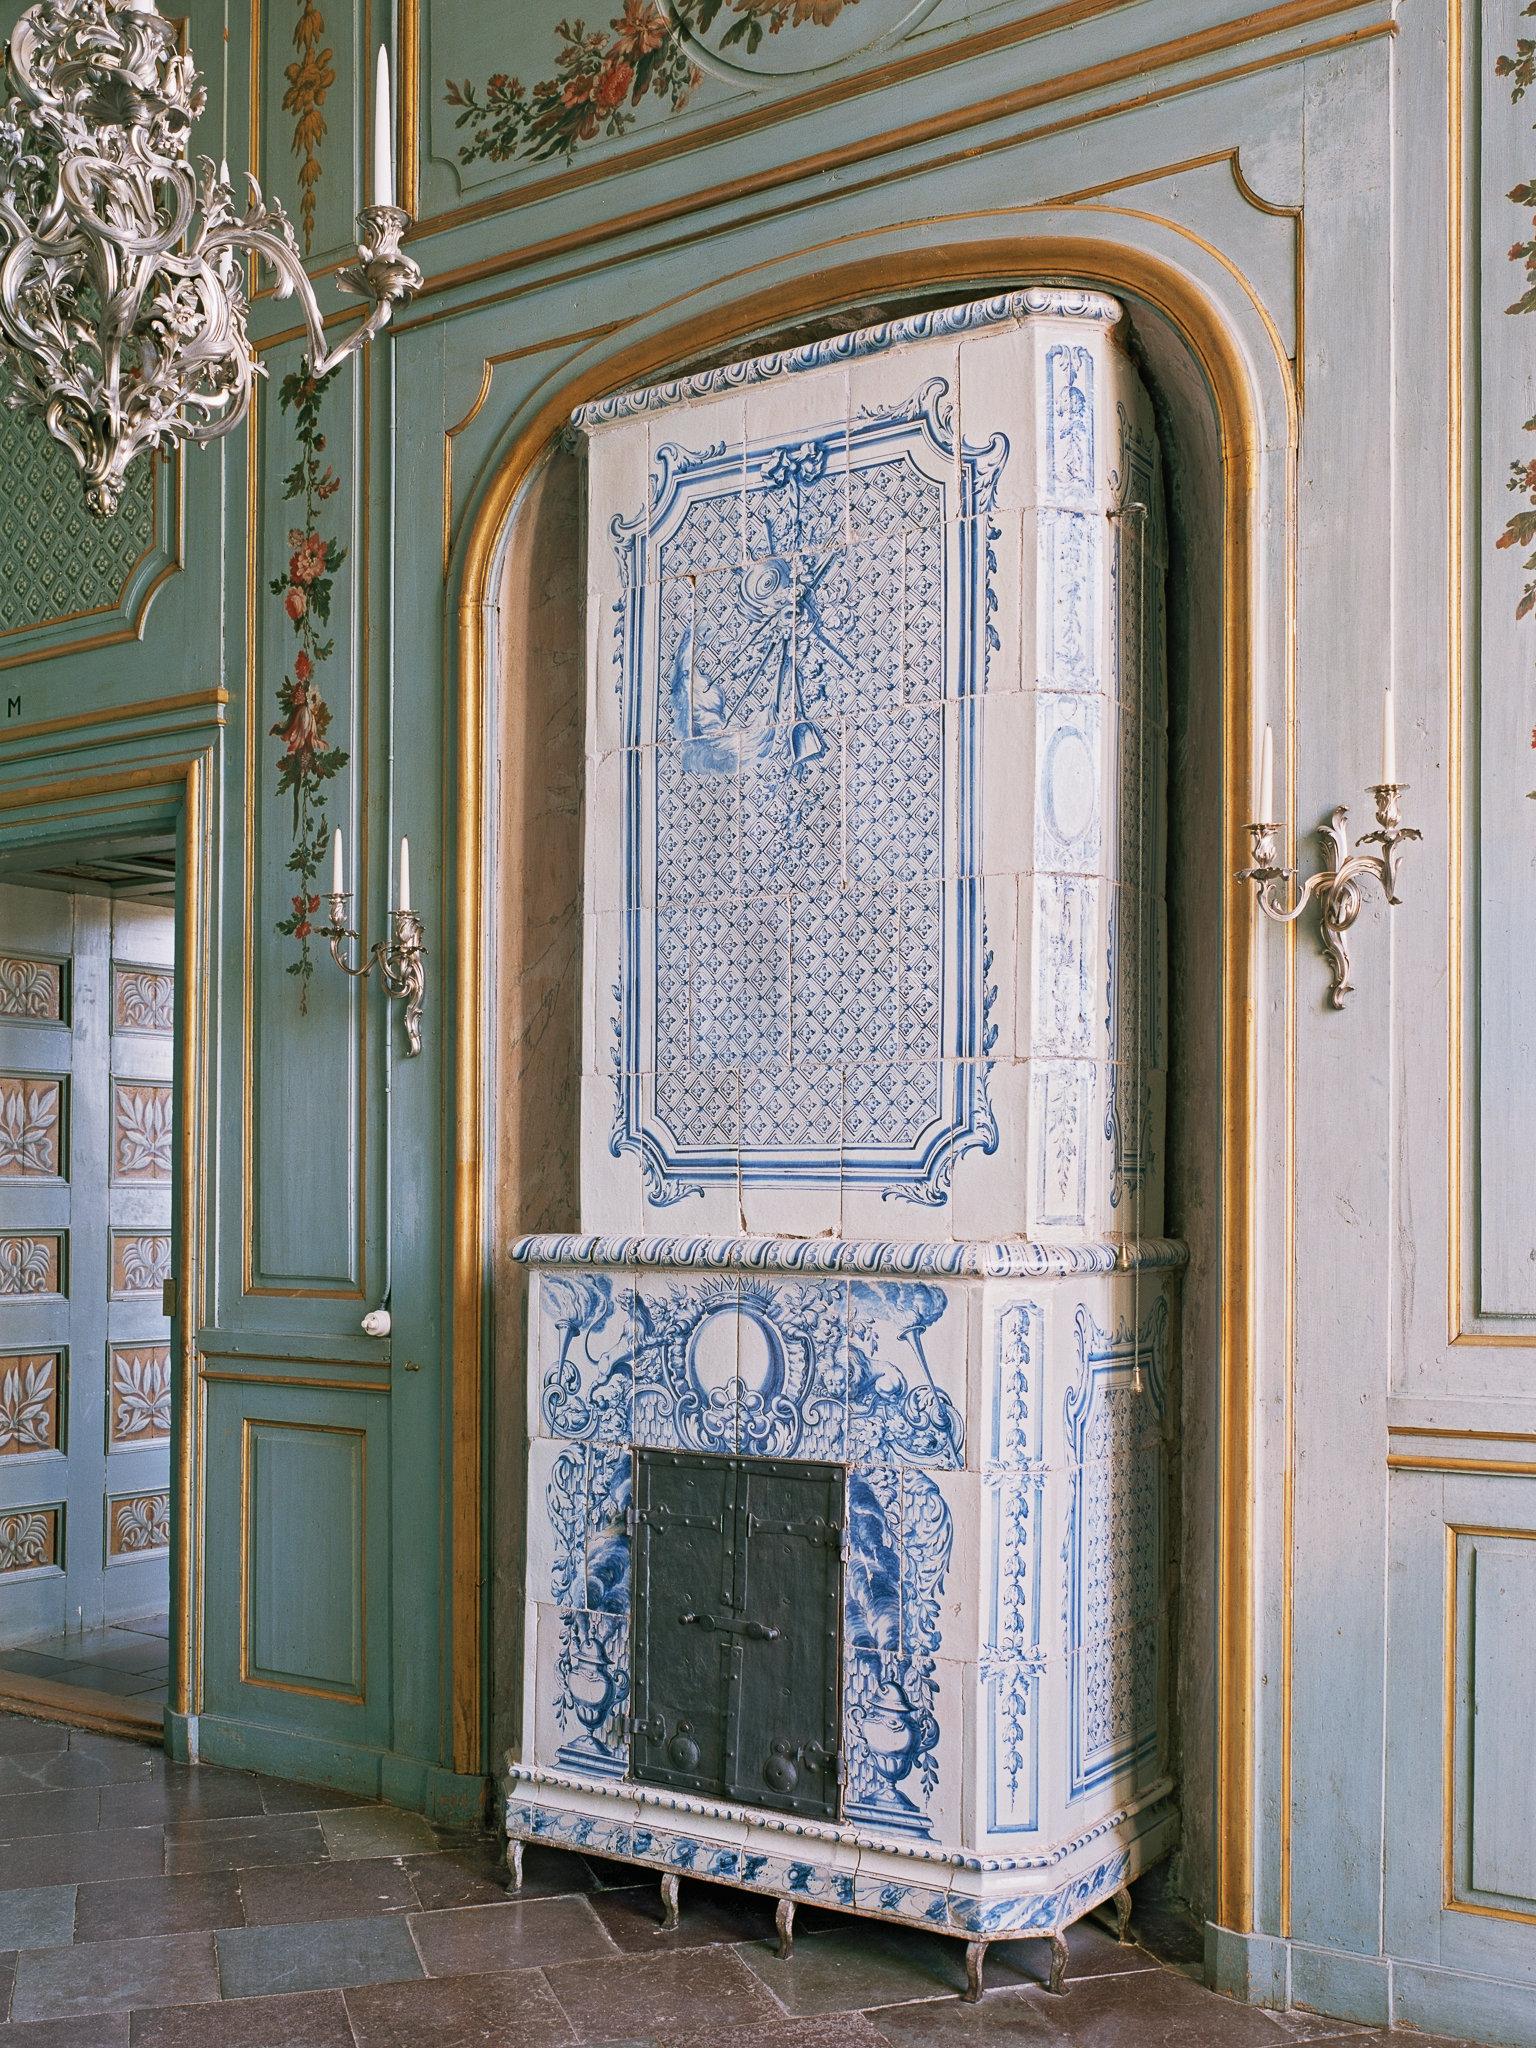 Drottningholms slott II